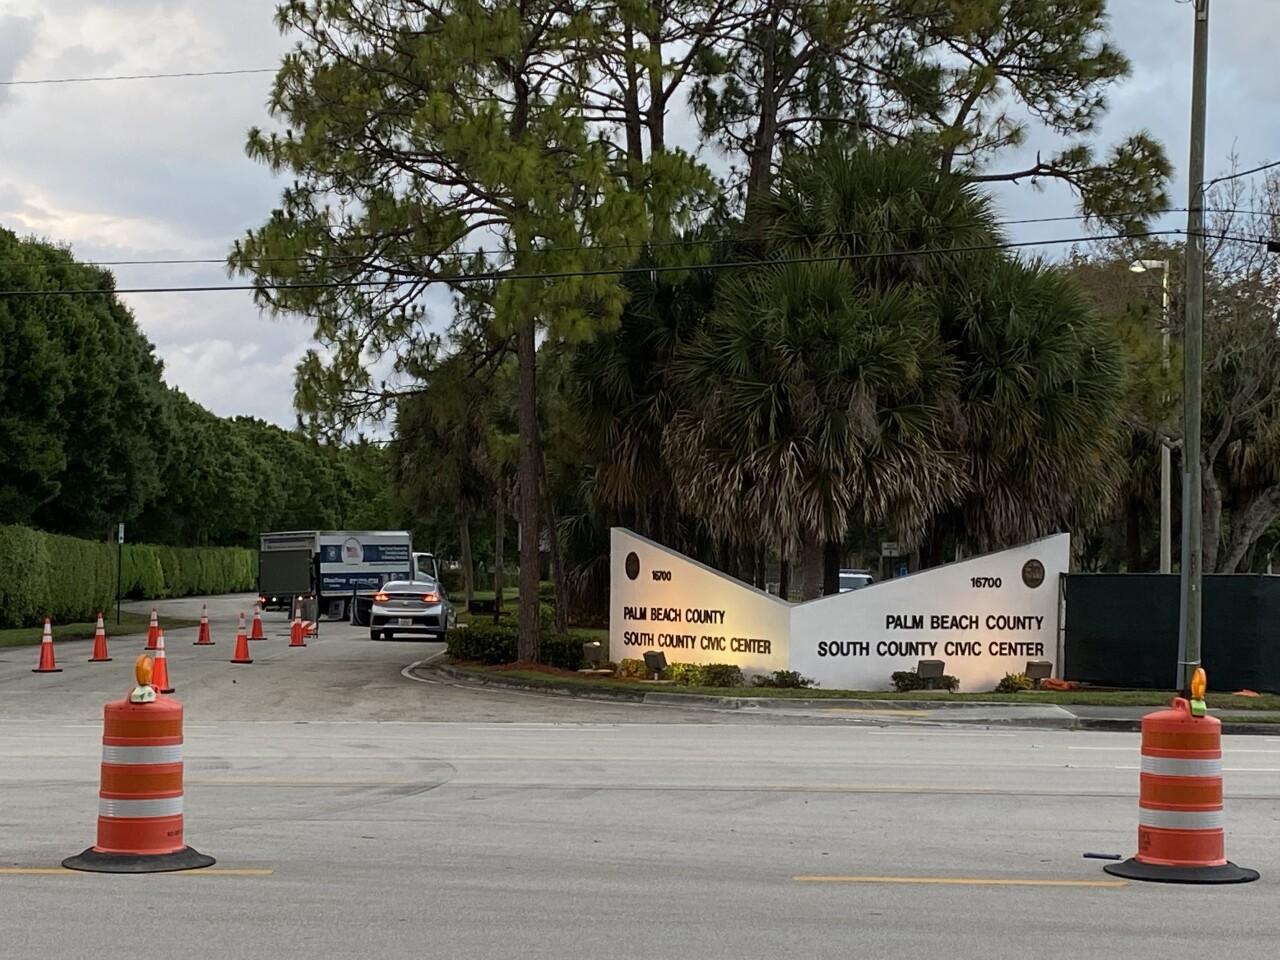 South County Civic Center entrance on eve of coronavirus testing